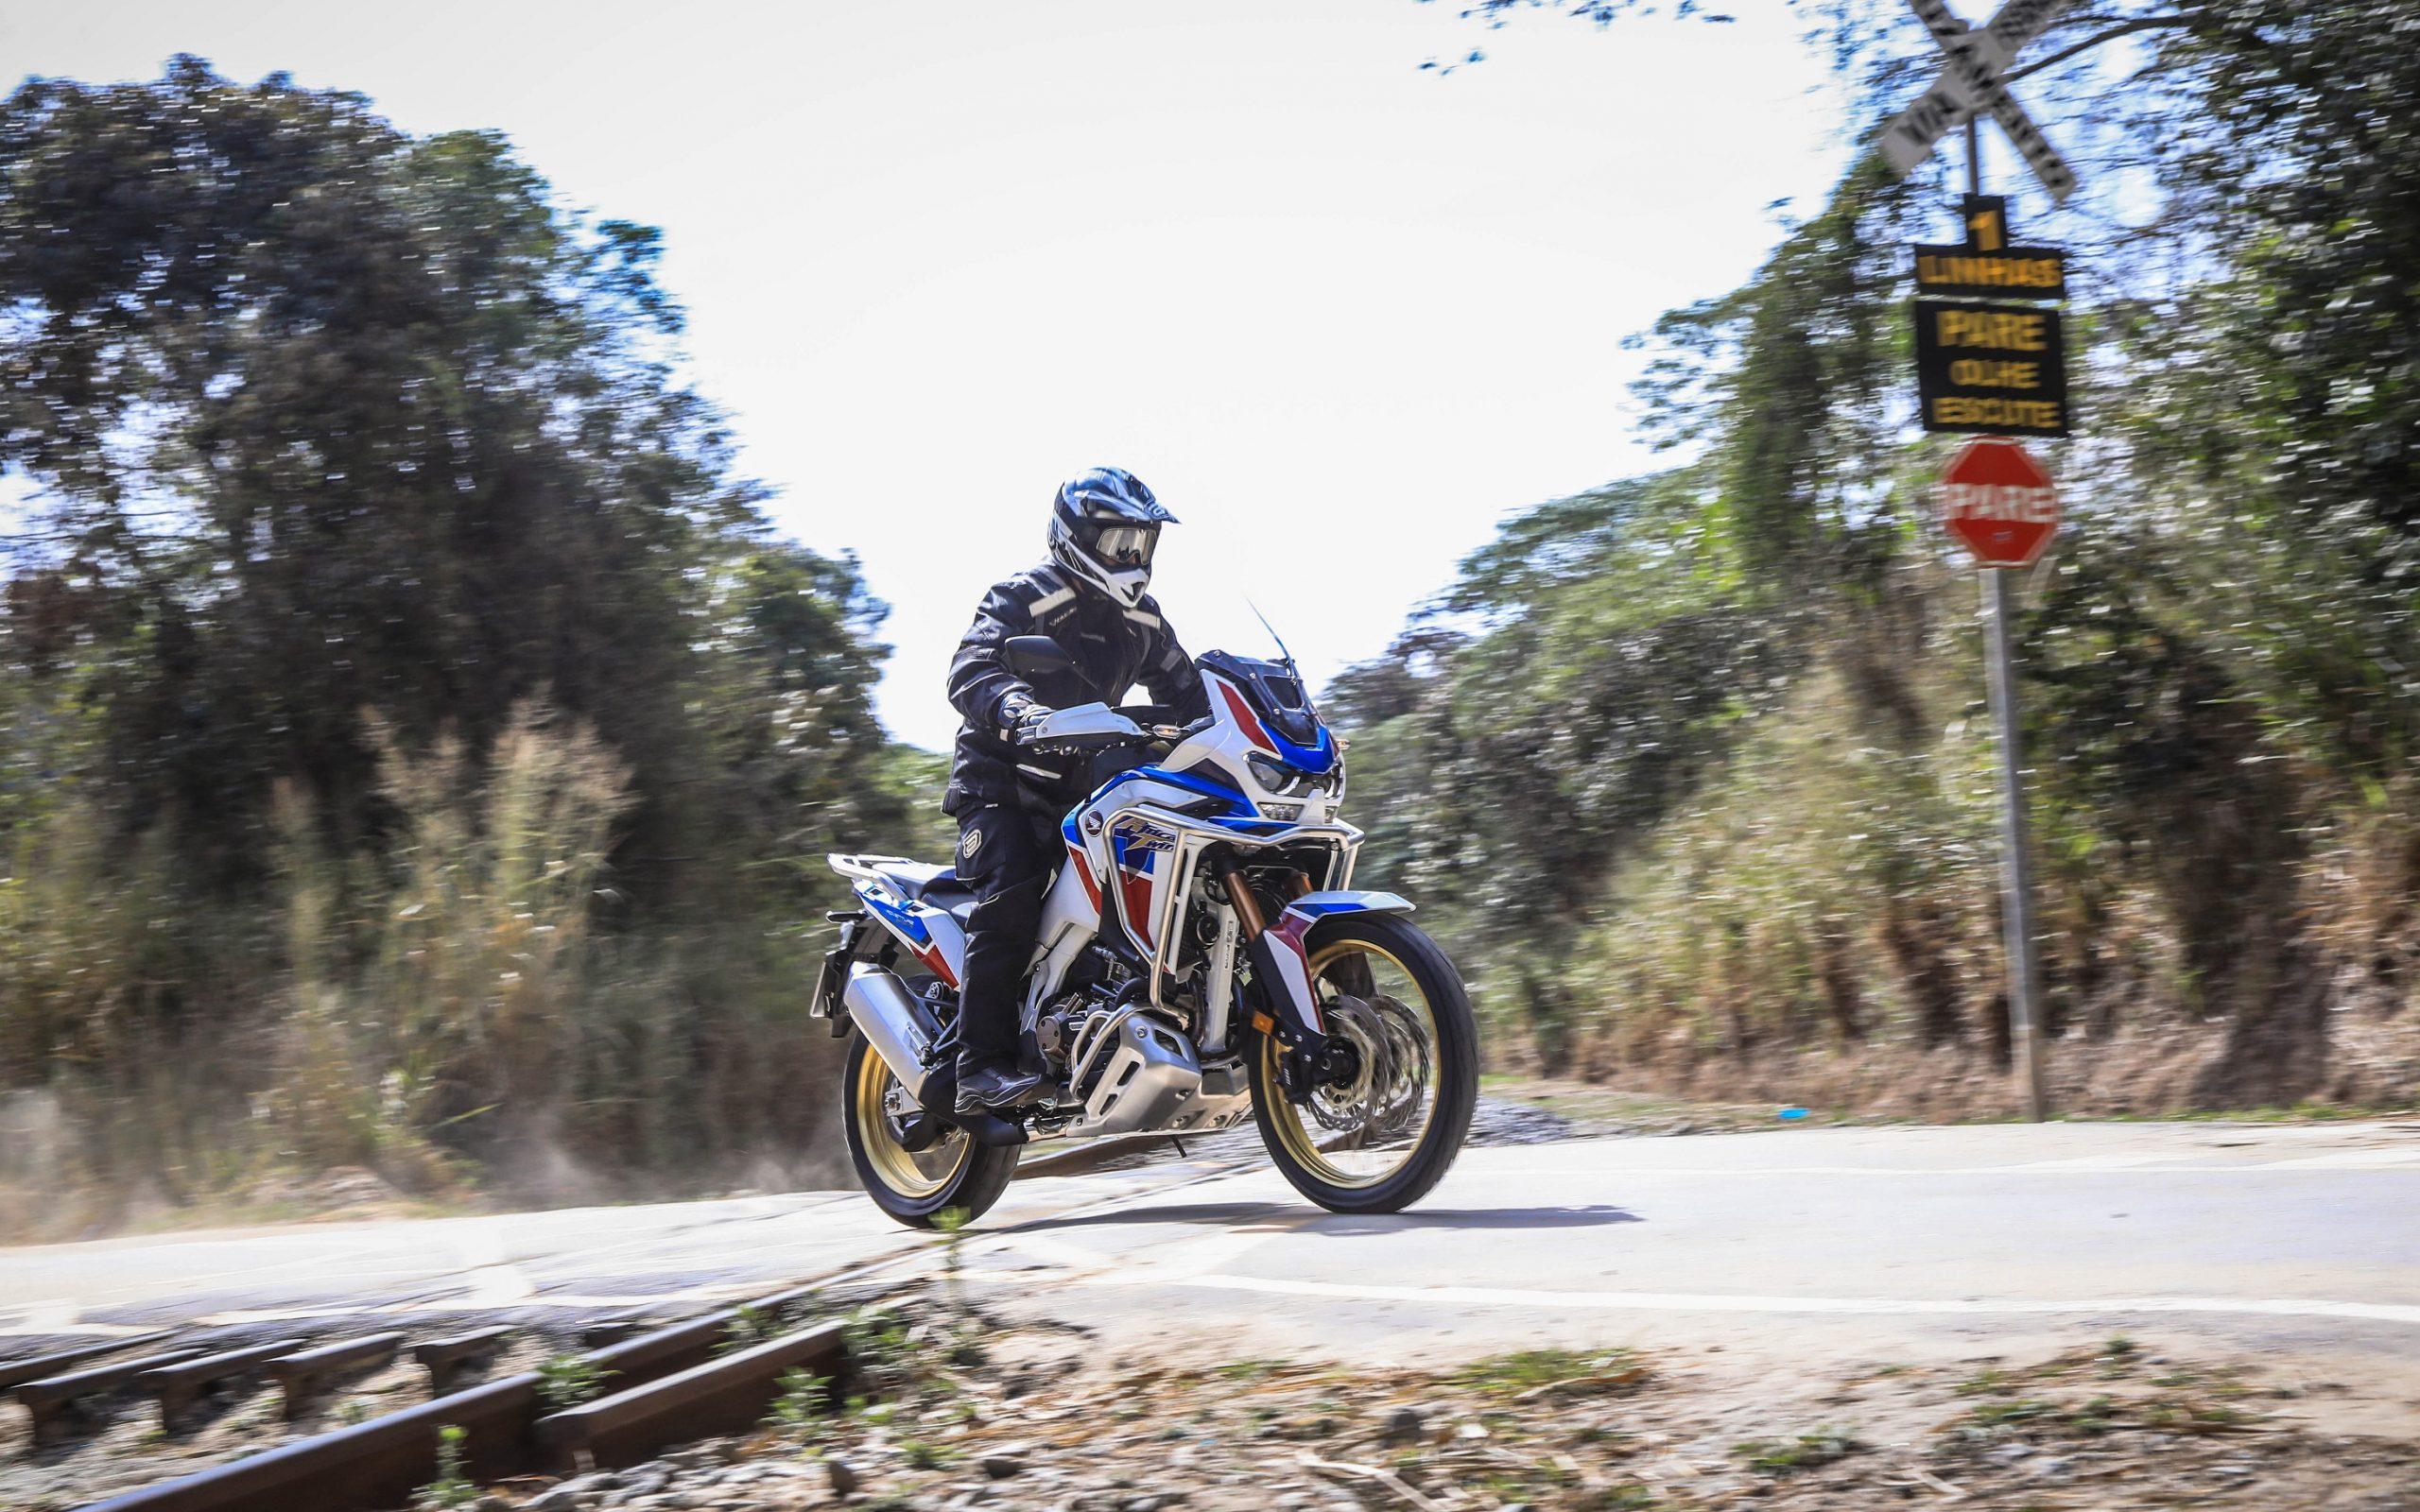 honda africa twin 1100 adventure sports dct teste 9